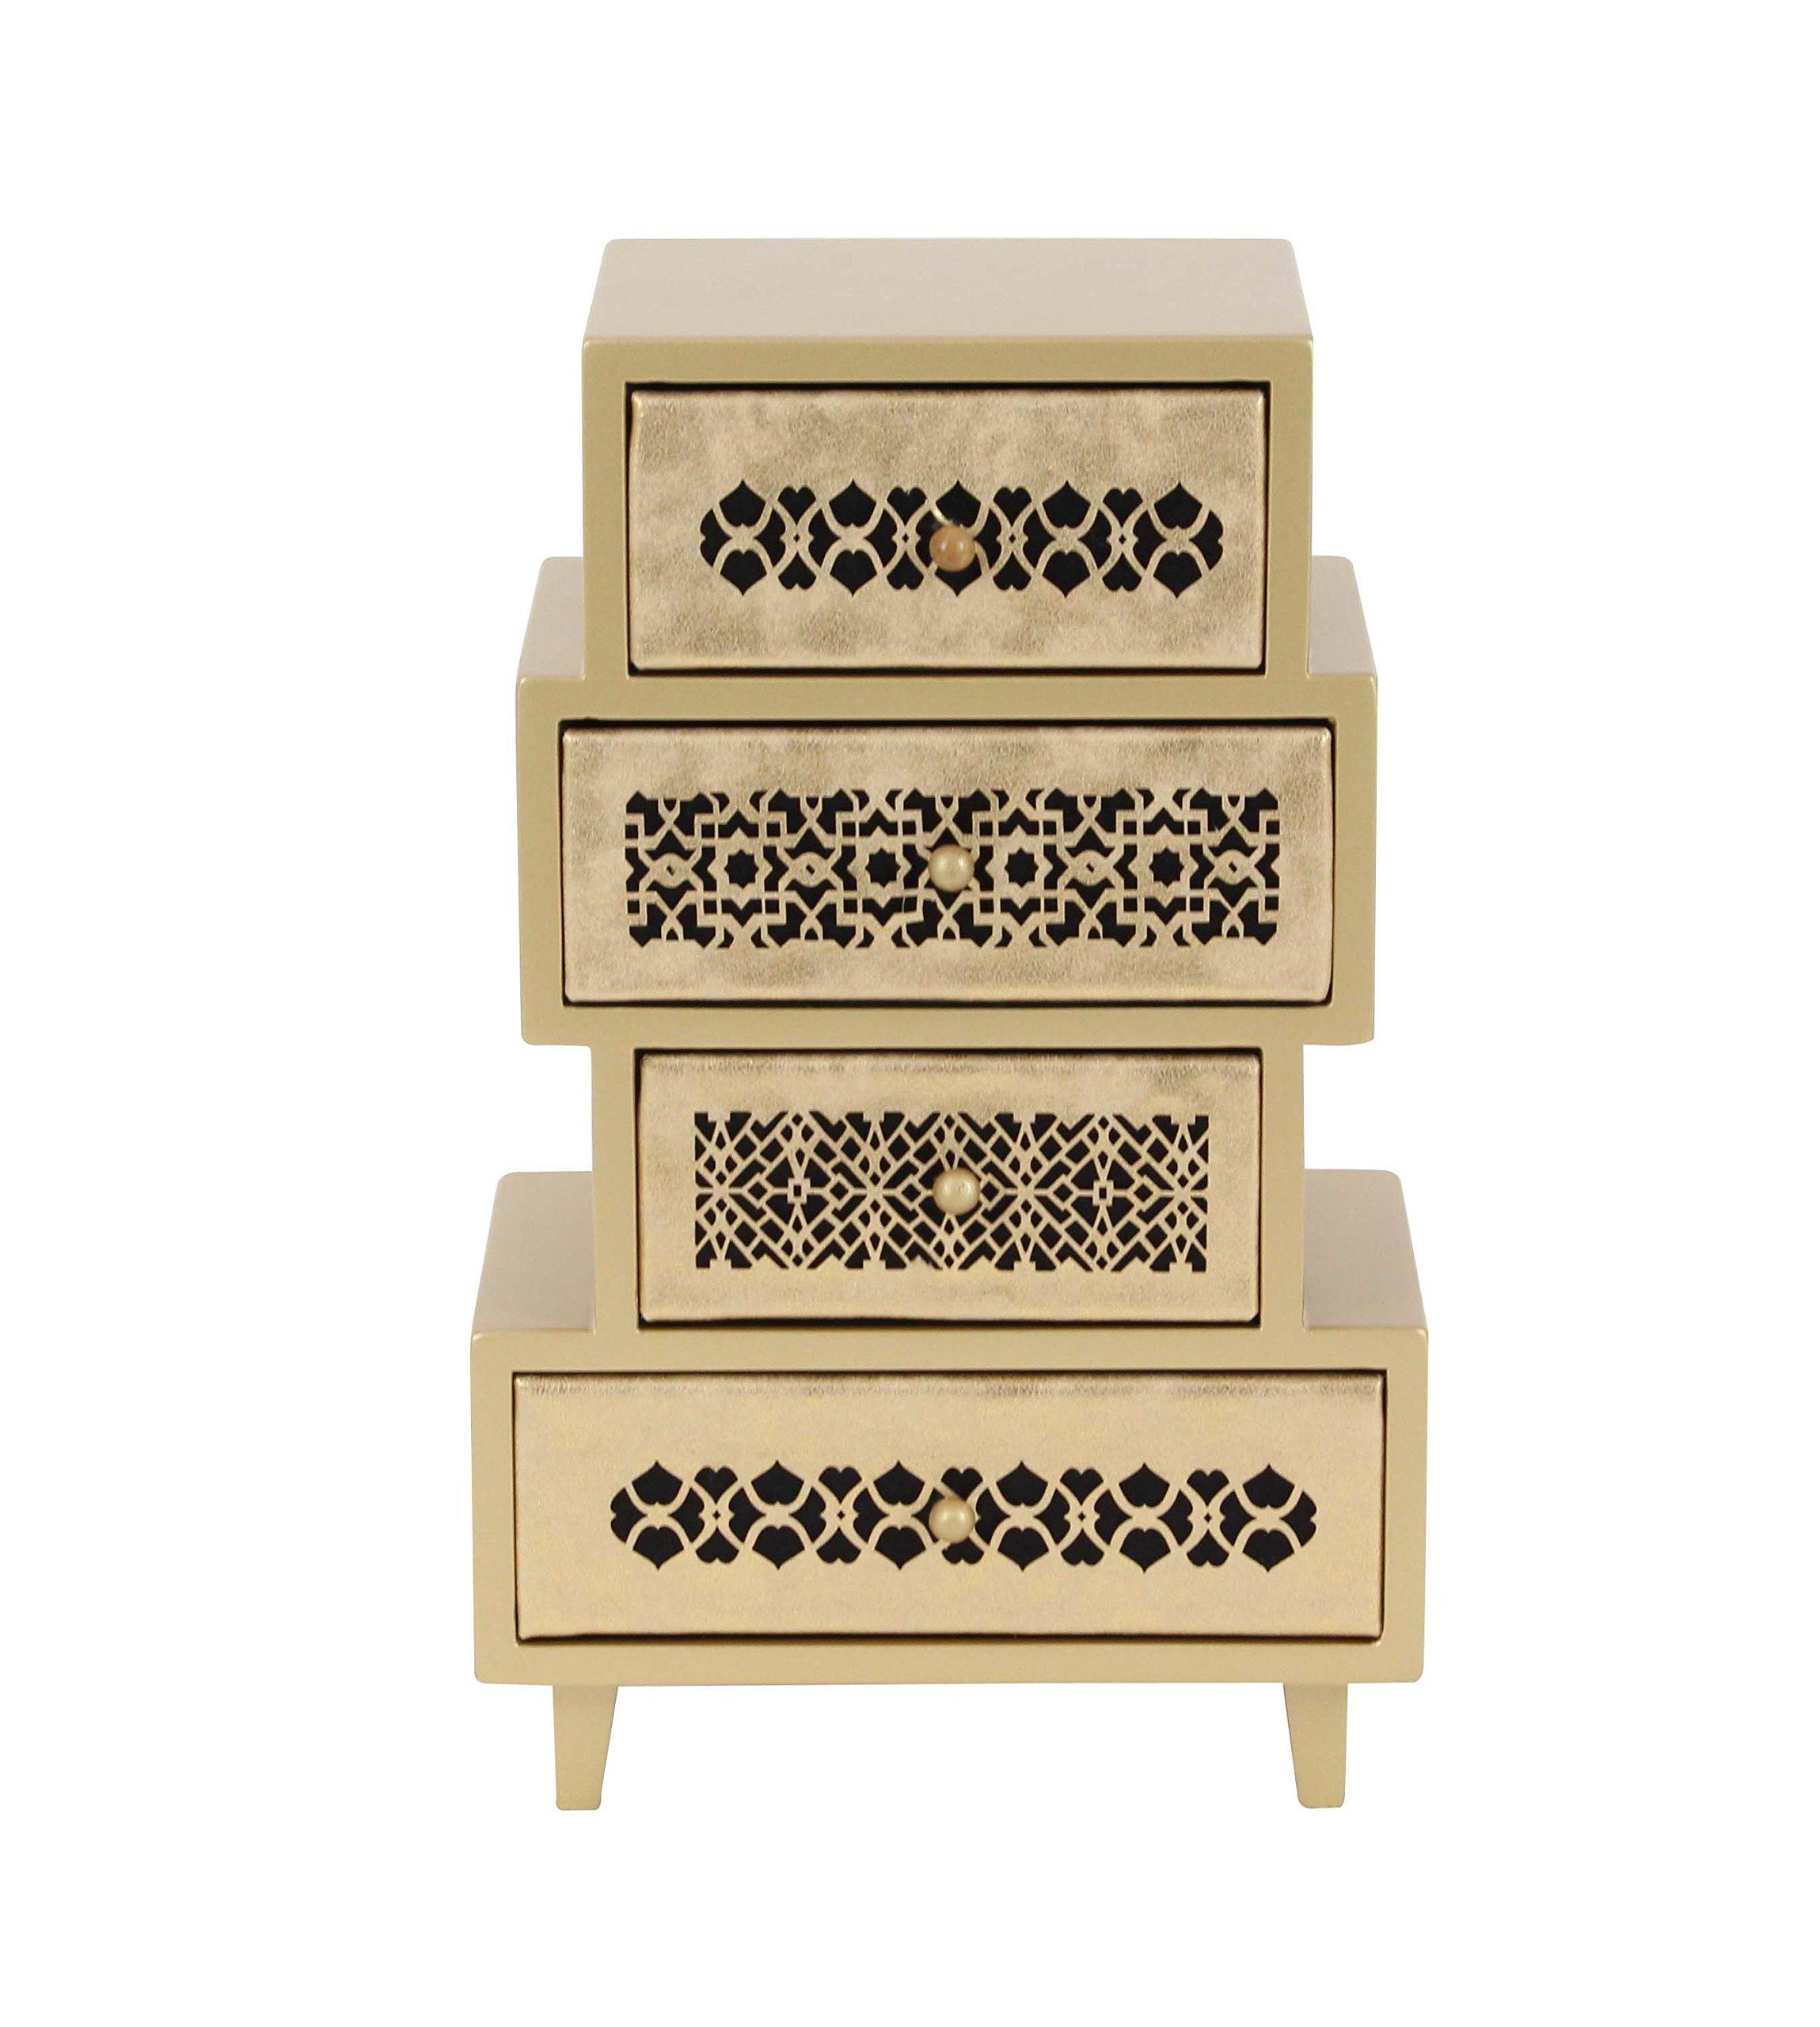 Deco 79 82183 Four-Drawer Asymmetrical-Shaped Jewelry Chest, 13'' x 8'', Palegold/Black